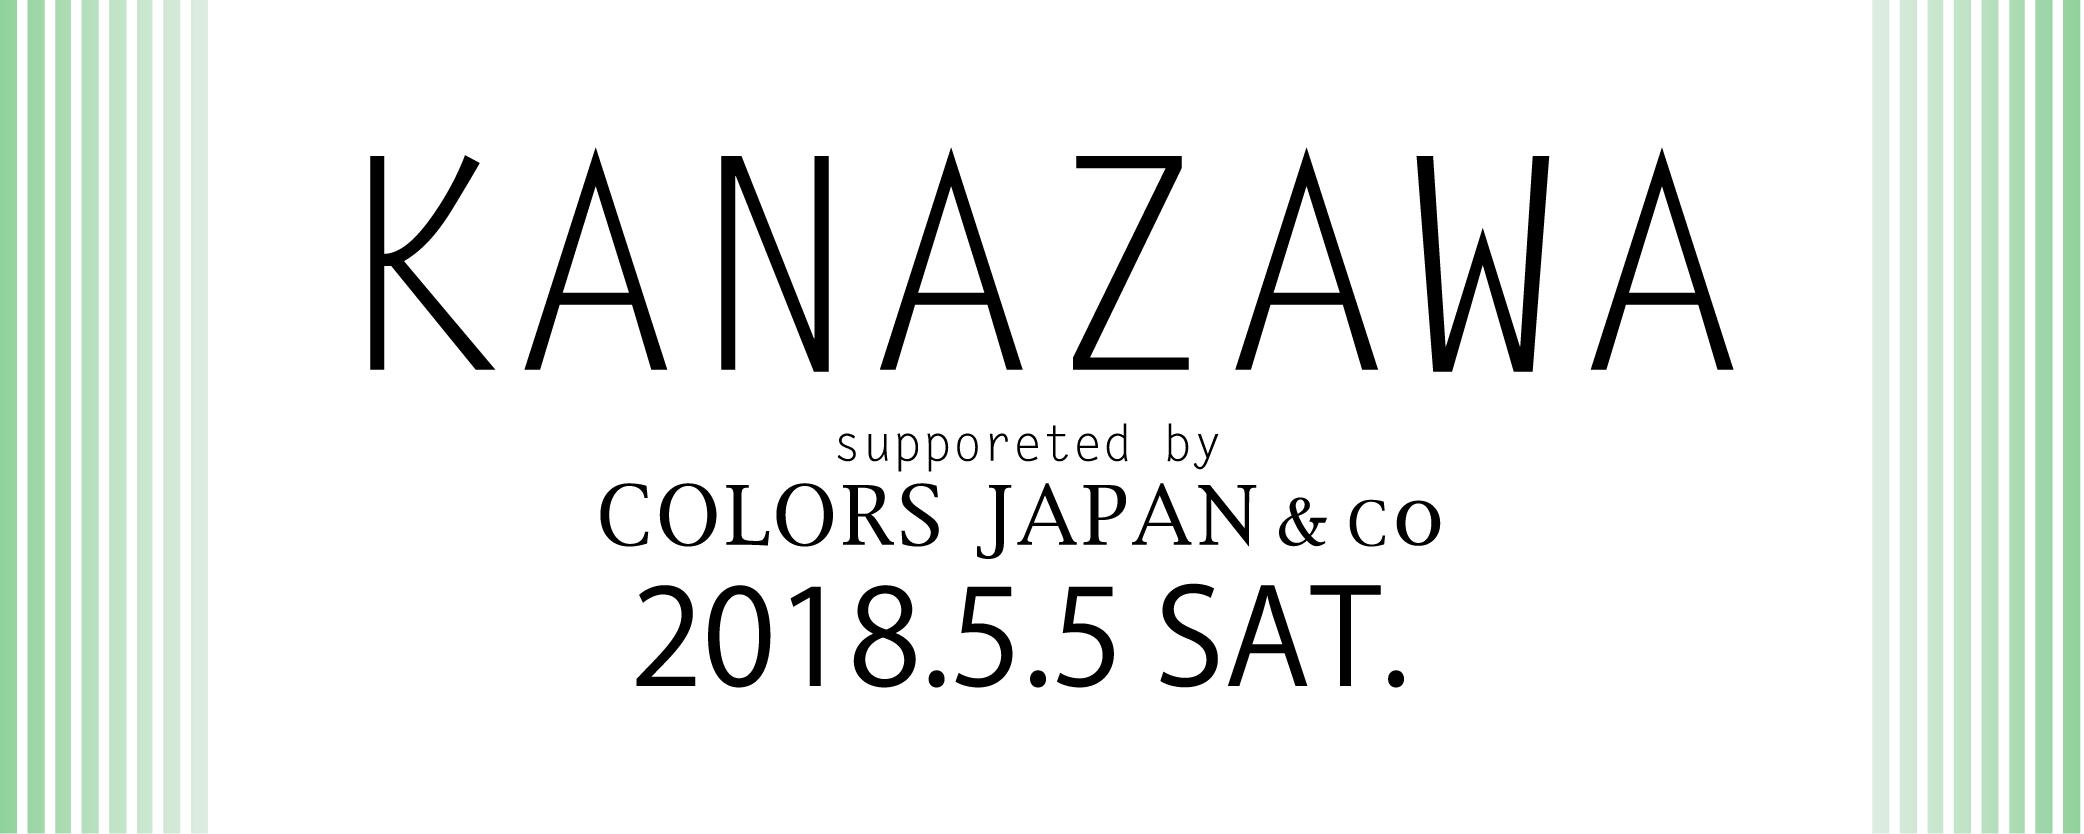 Girls Meeting KANAZAWA 2018